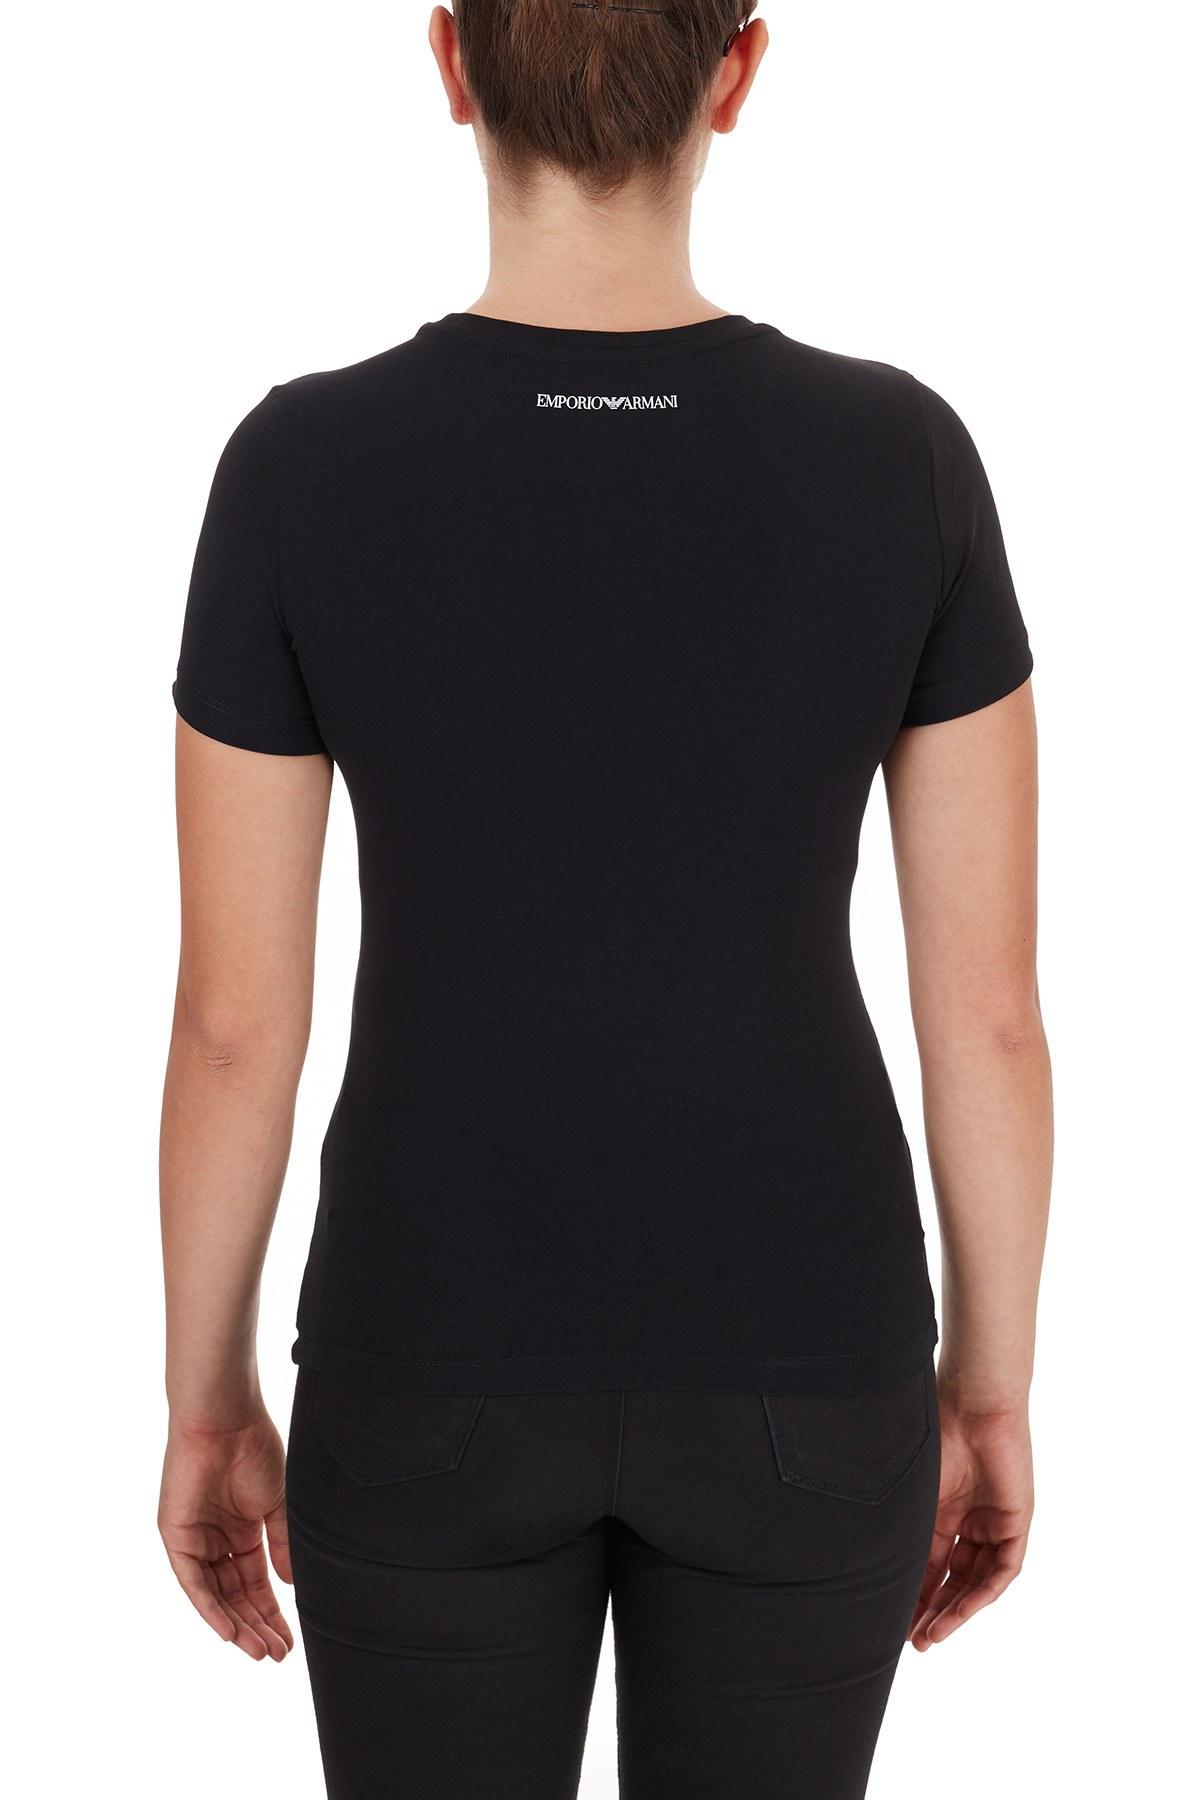 Emporio Armani Bayan T Shirt 6H2T7N 2J07Z 0999 SİYAH